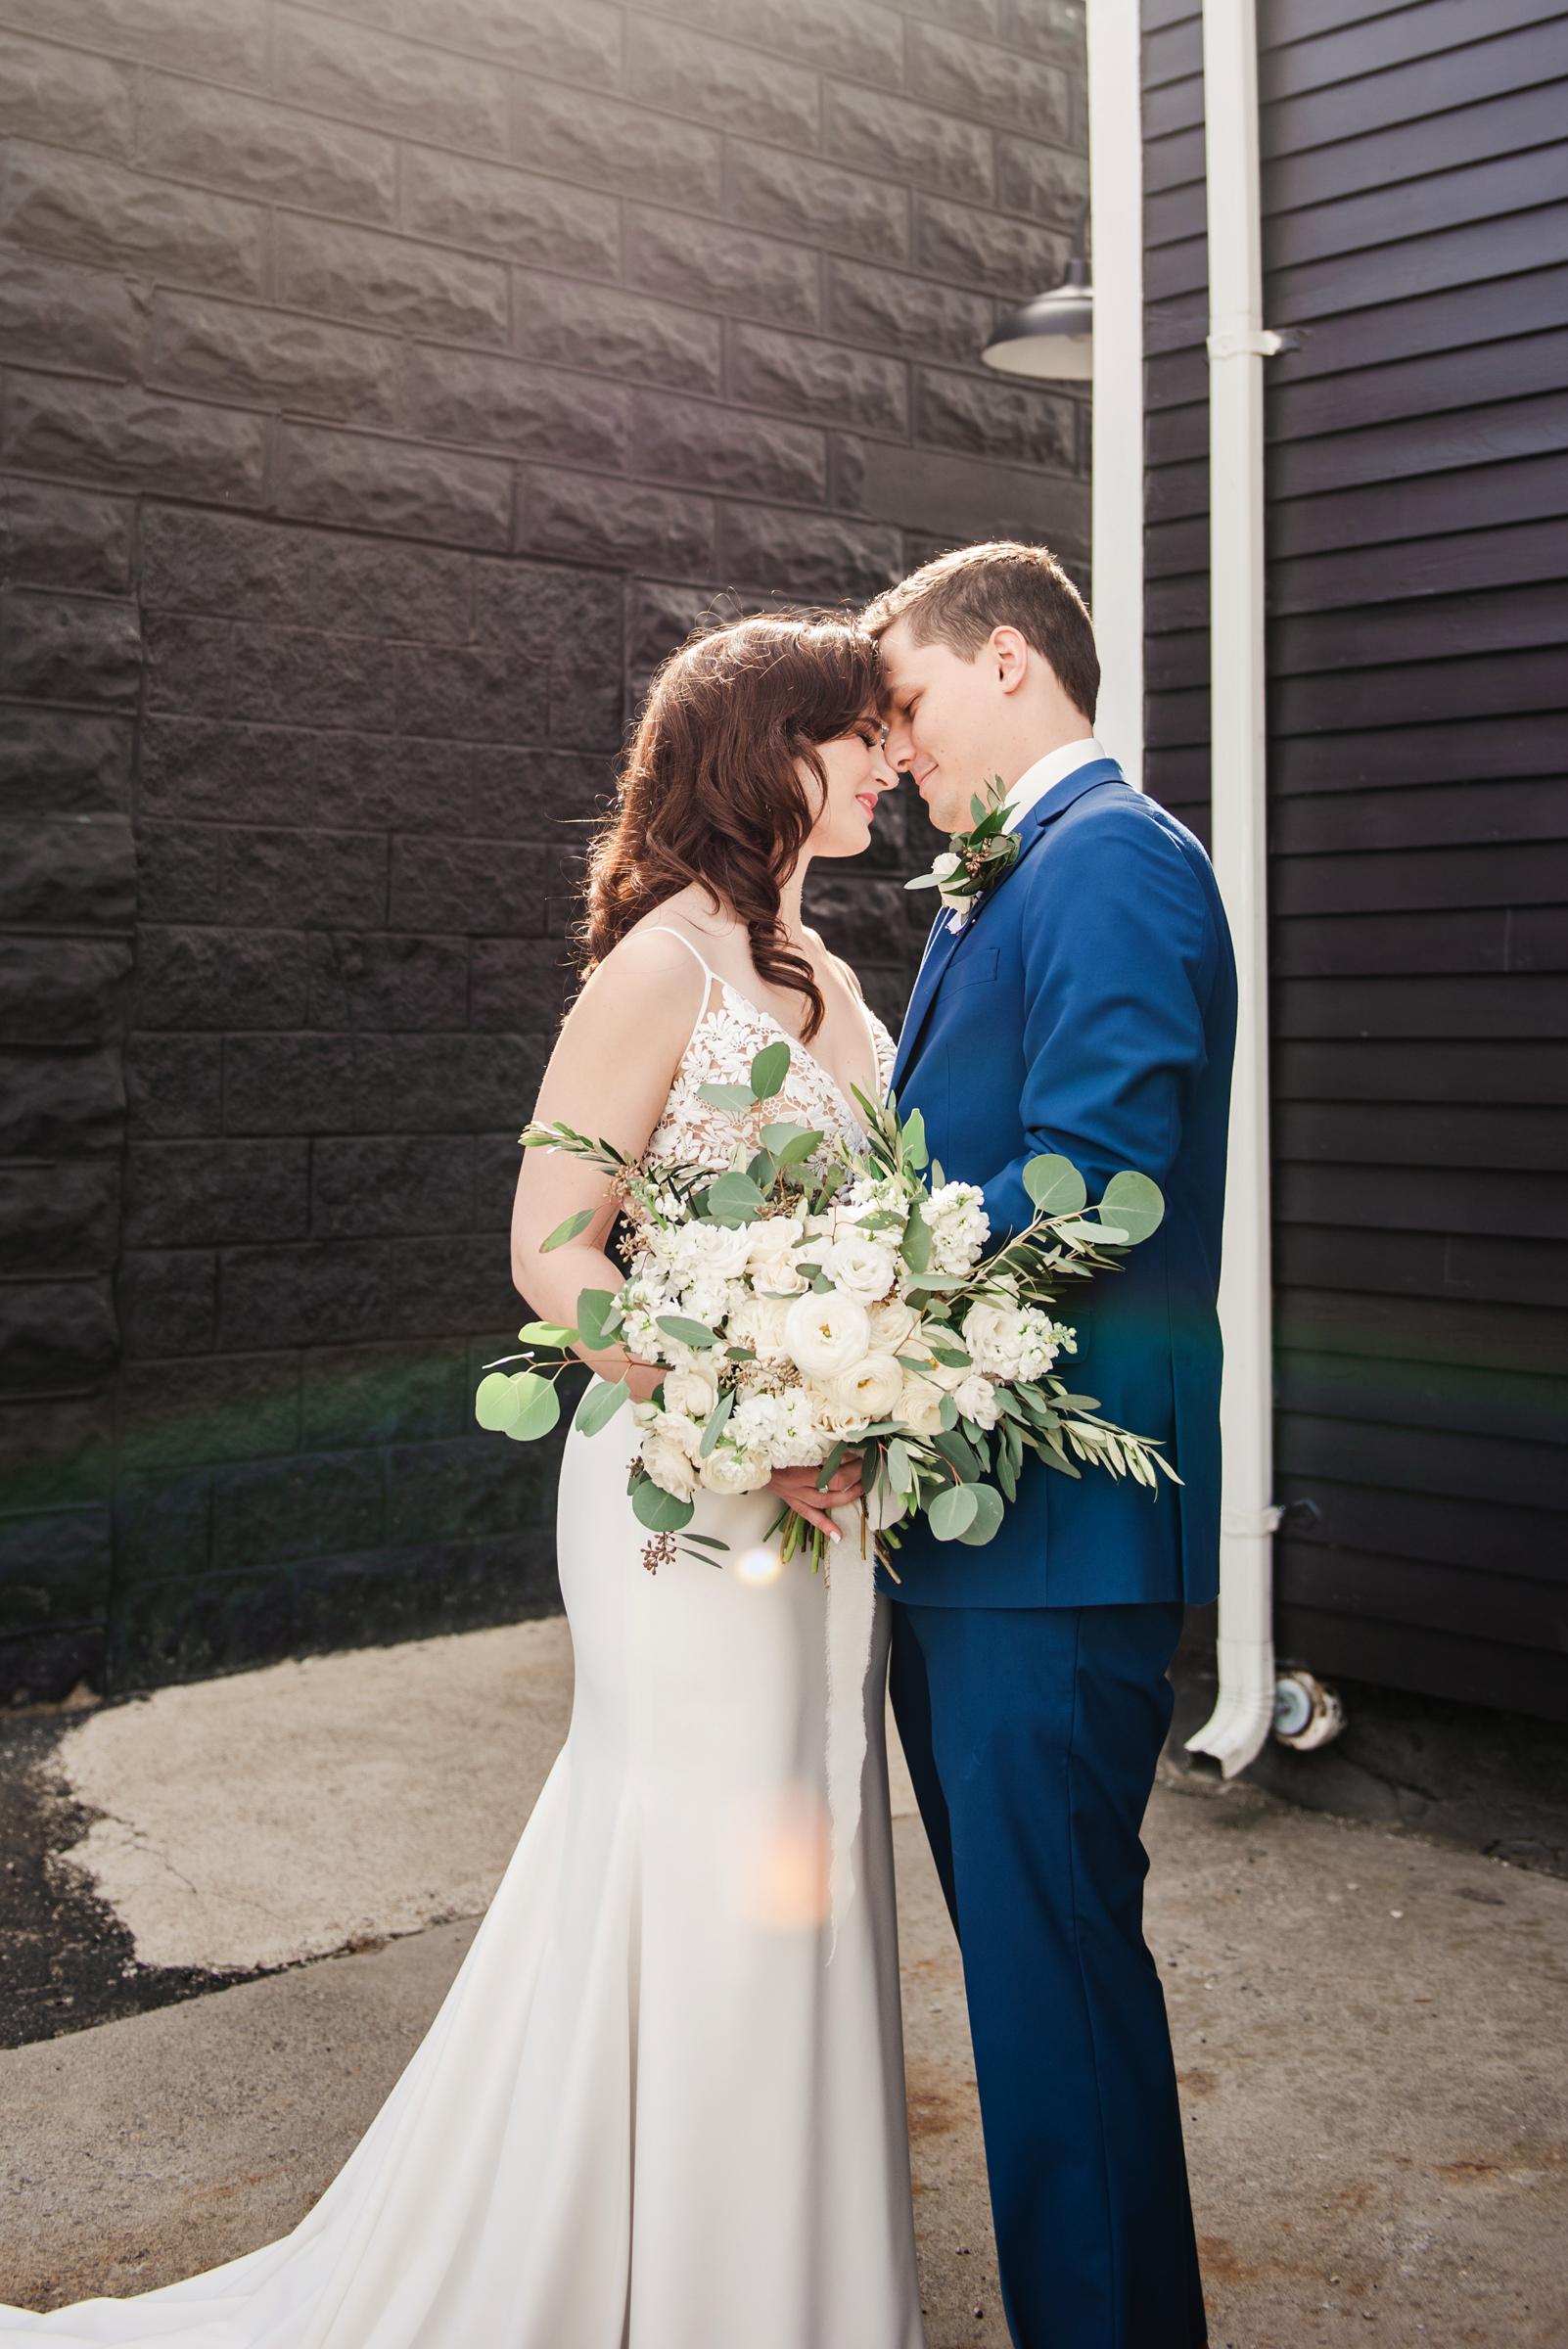 The_Arbor_LoftRochester_Wedding_JILL_STUDIO_Rochester_NY_Photographer_155847.jpg